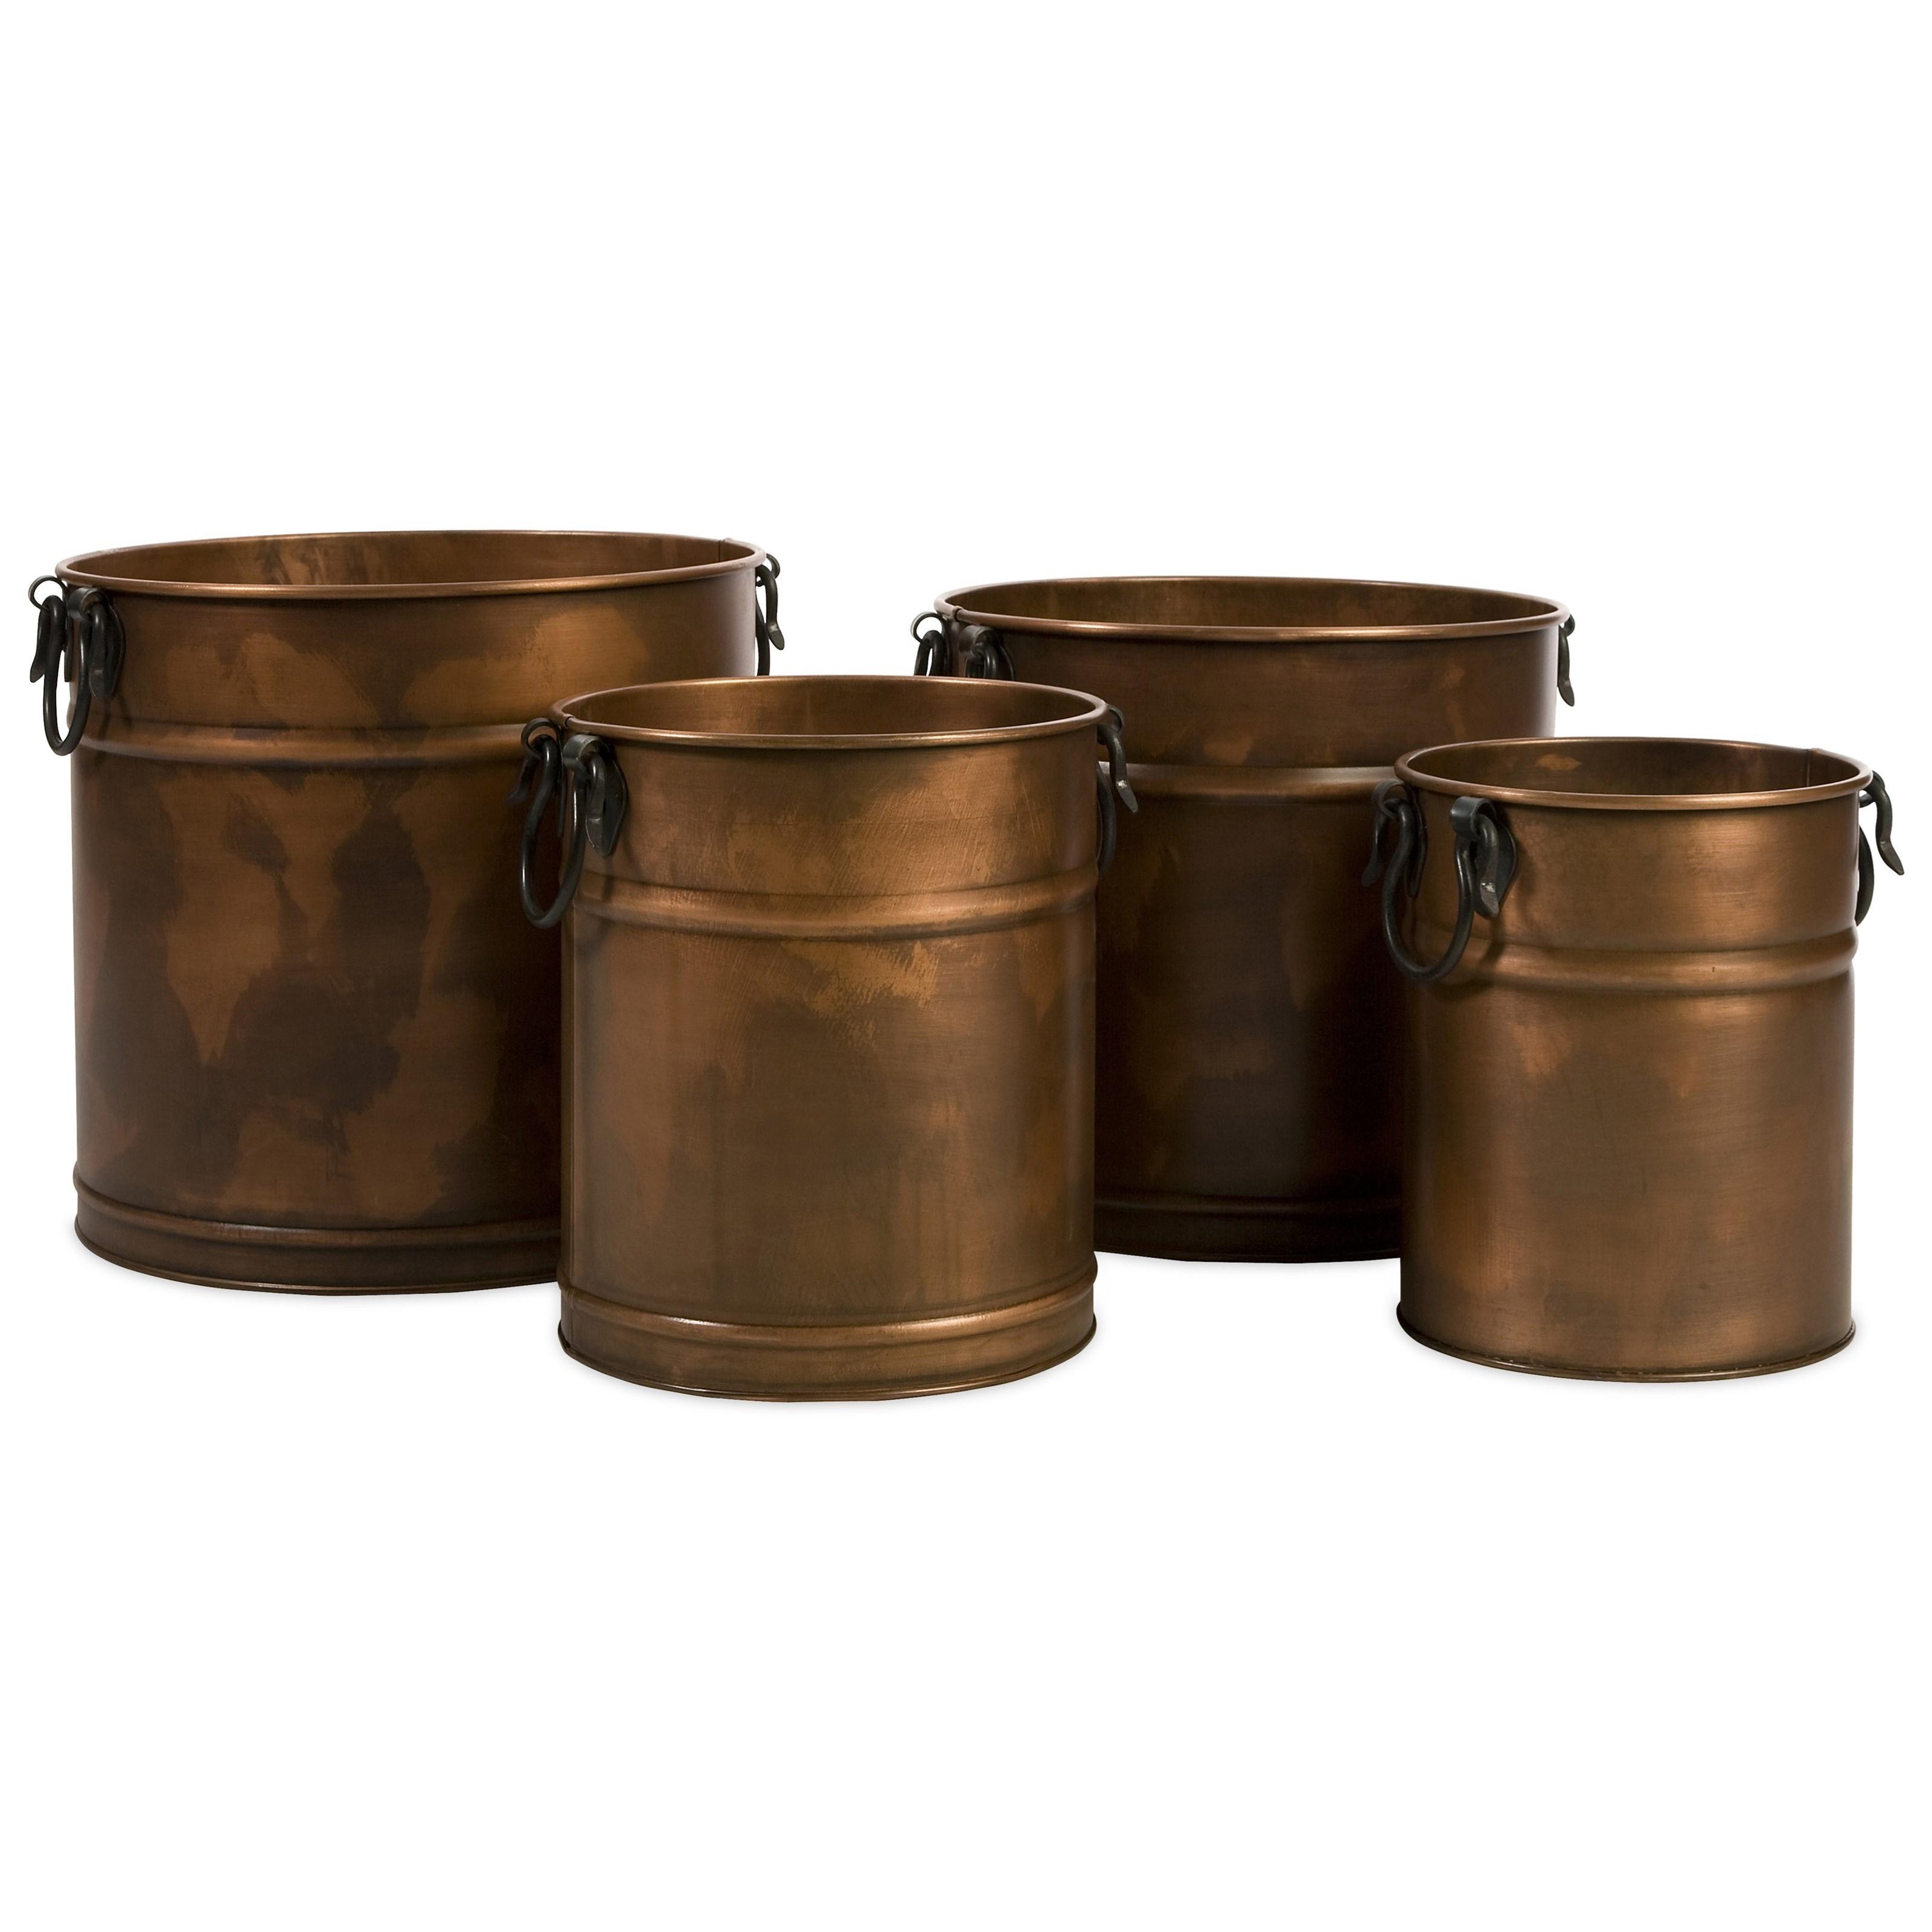 IMAX Worldwide Home Pots And PlantersTauba Round Copper Finish Planters    Set Of